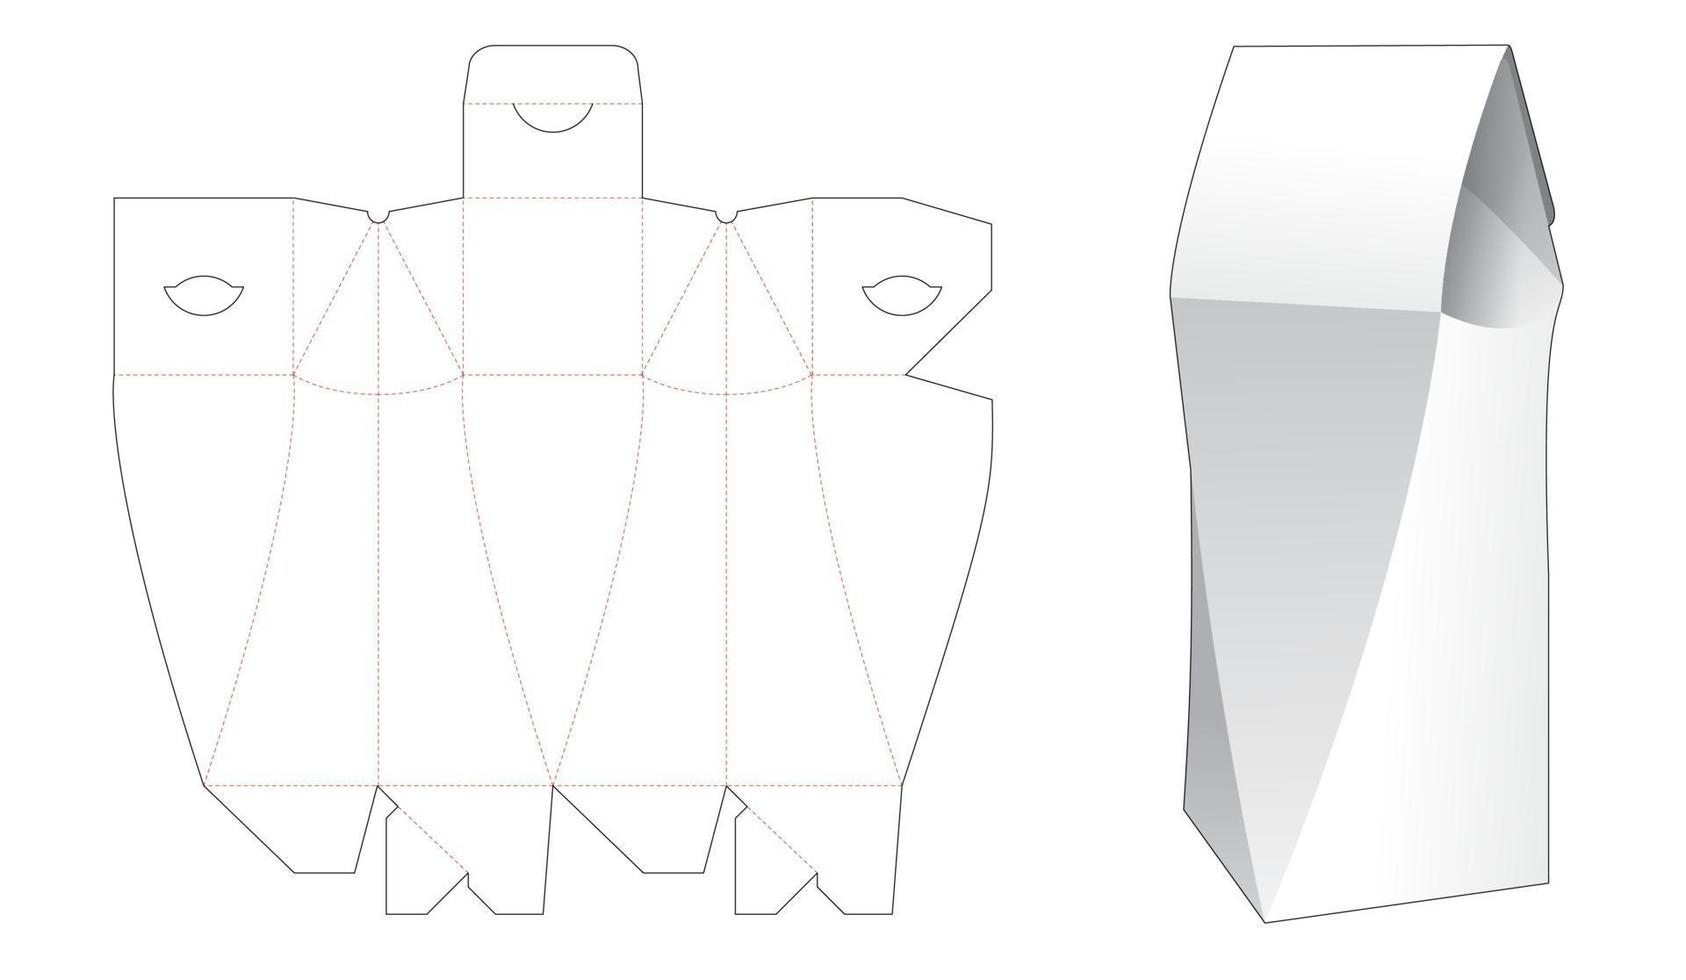 molde chanfrado pylon flip box vetor